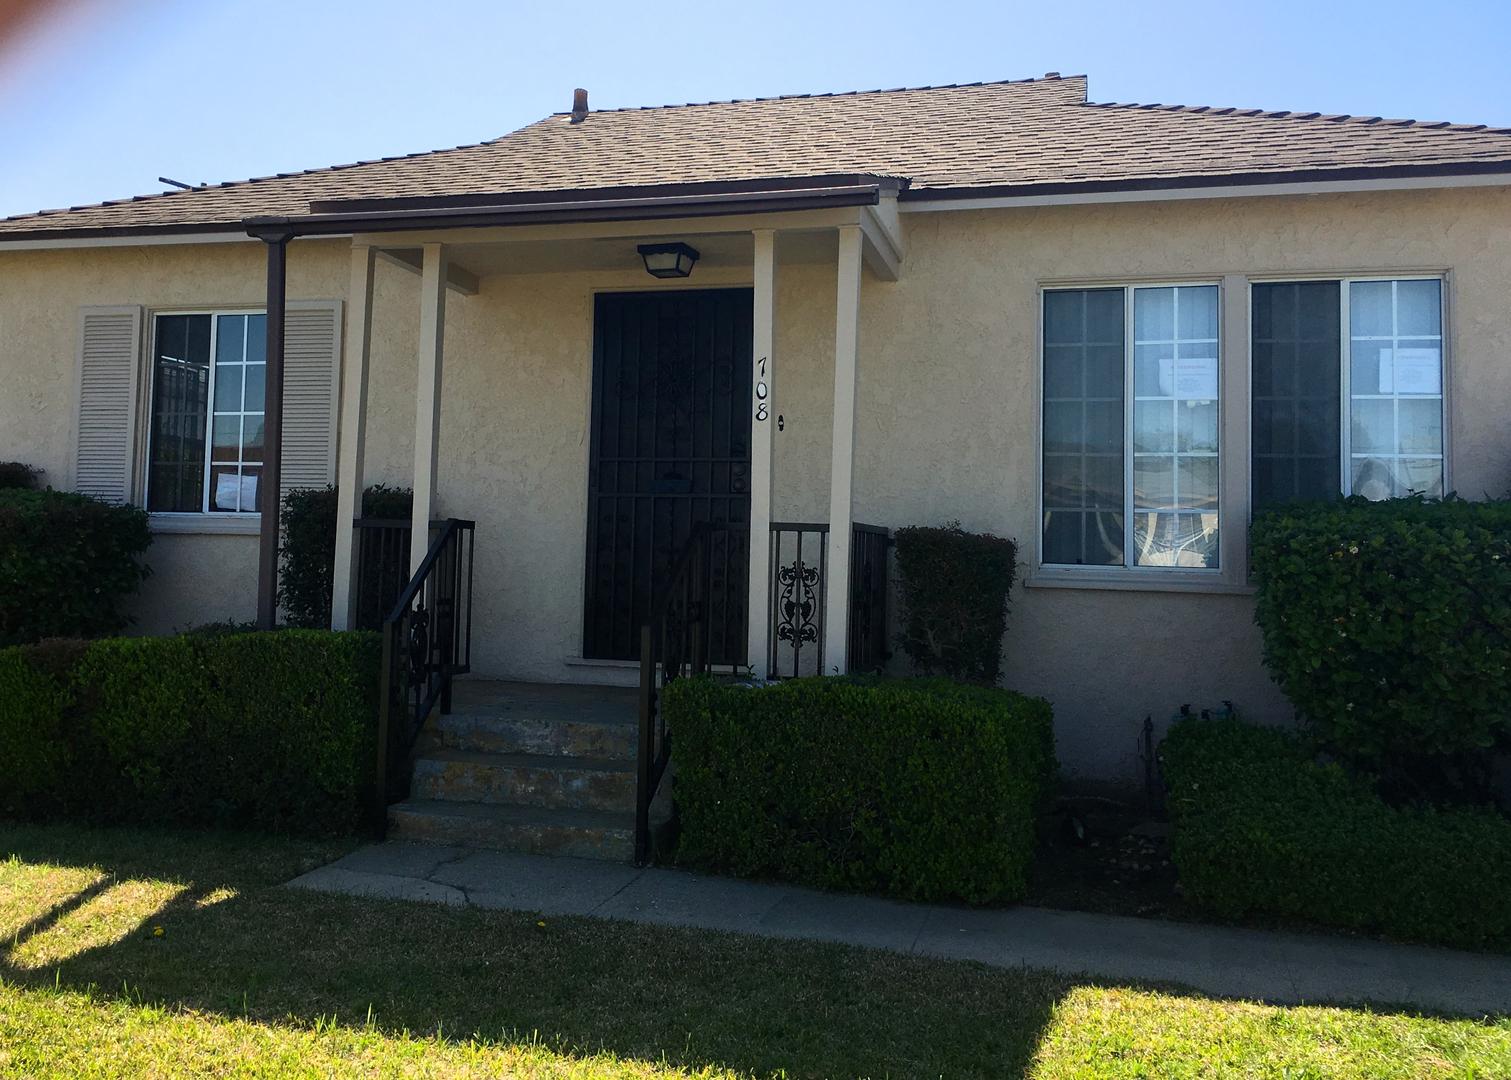 513 W Fairview Blvd, Inglewood